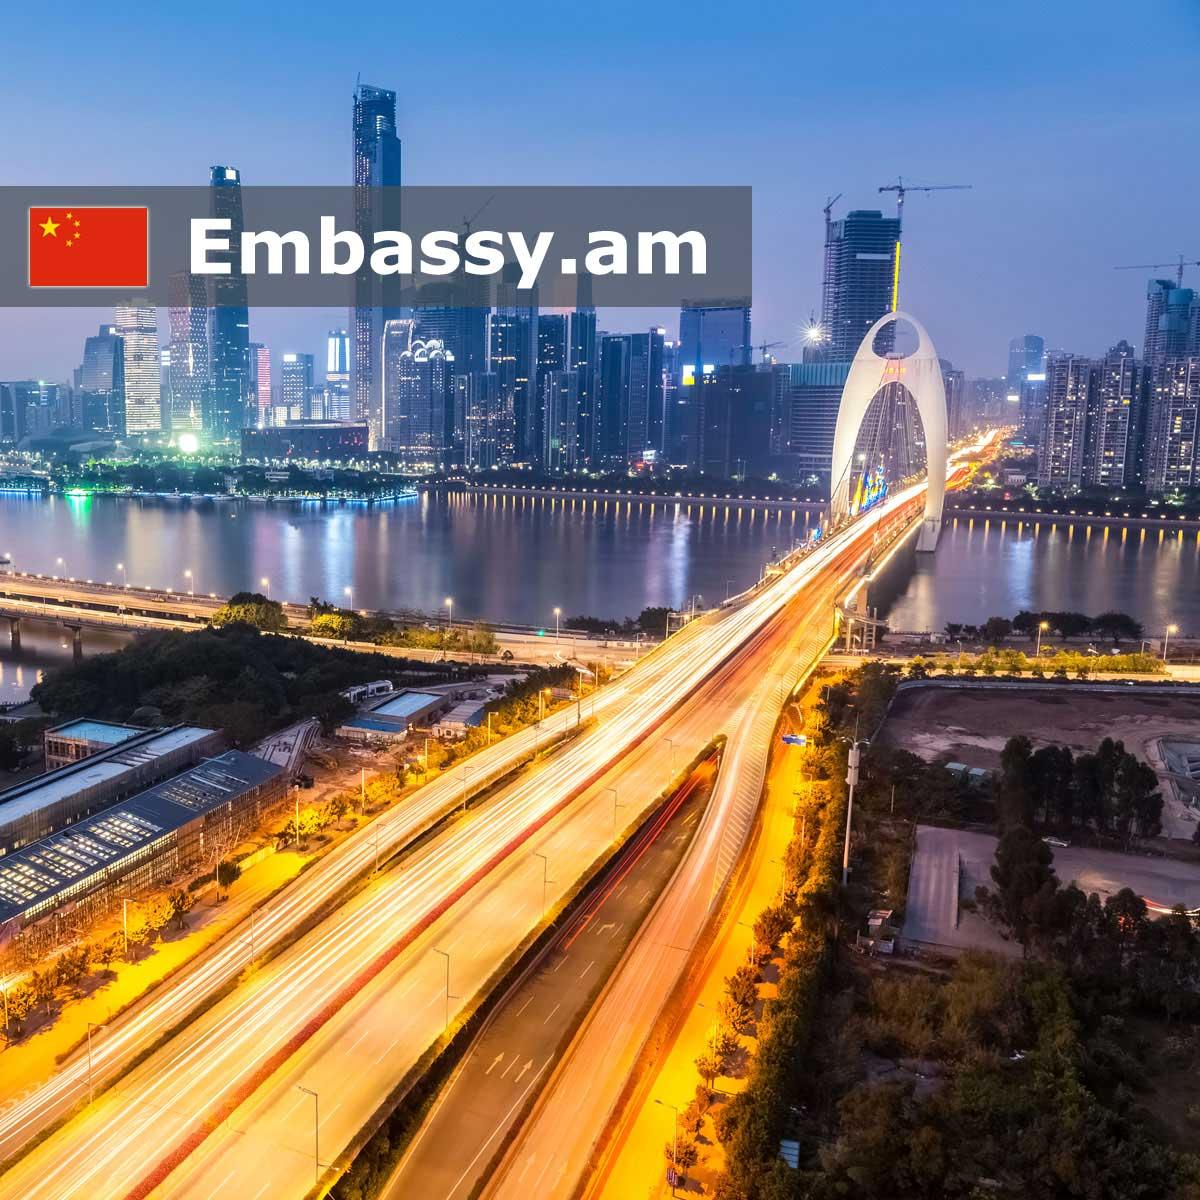 Guangzhou - Hotels in China - Embassy.am